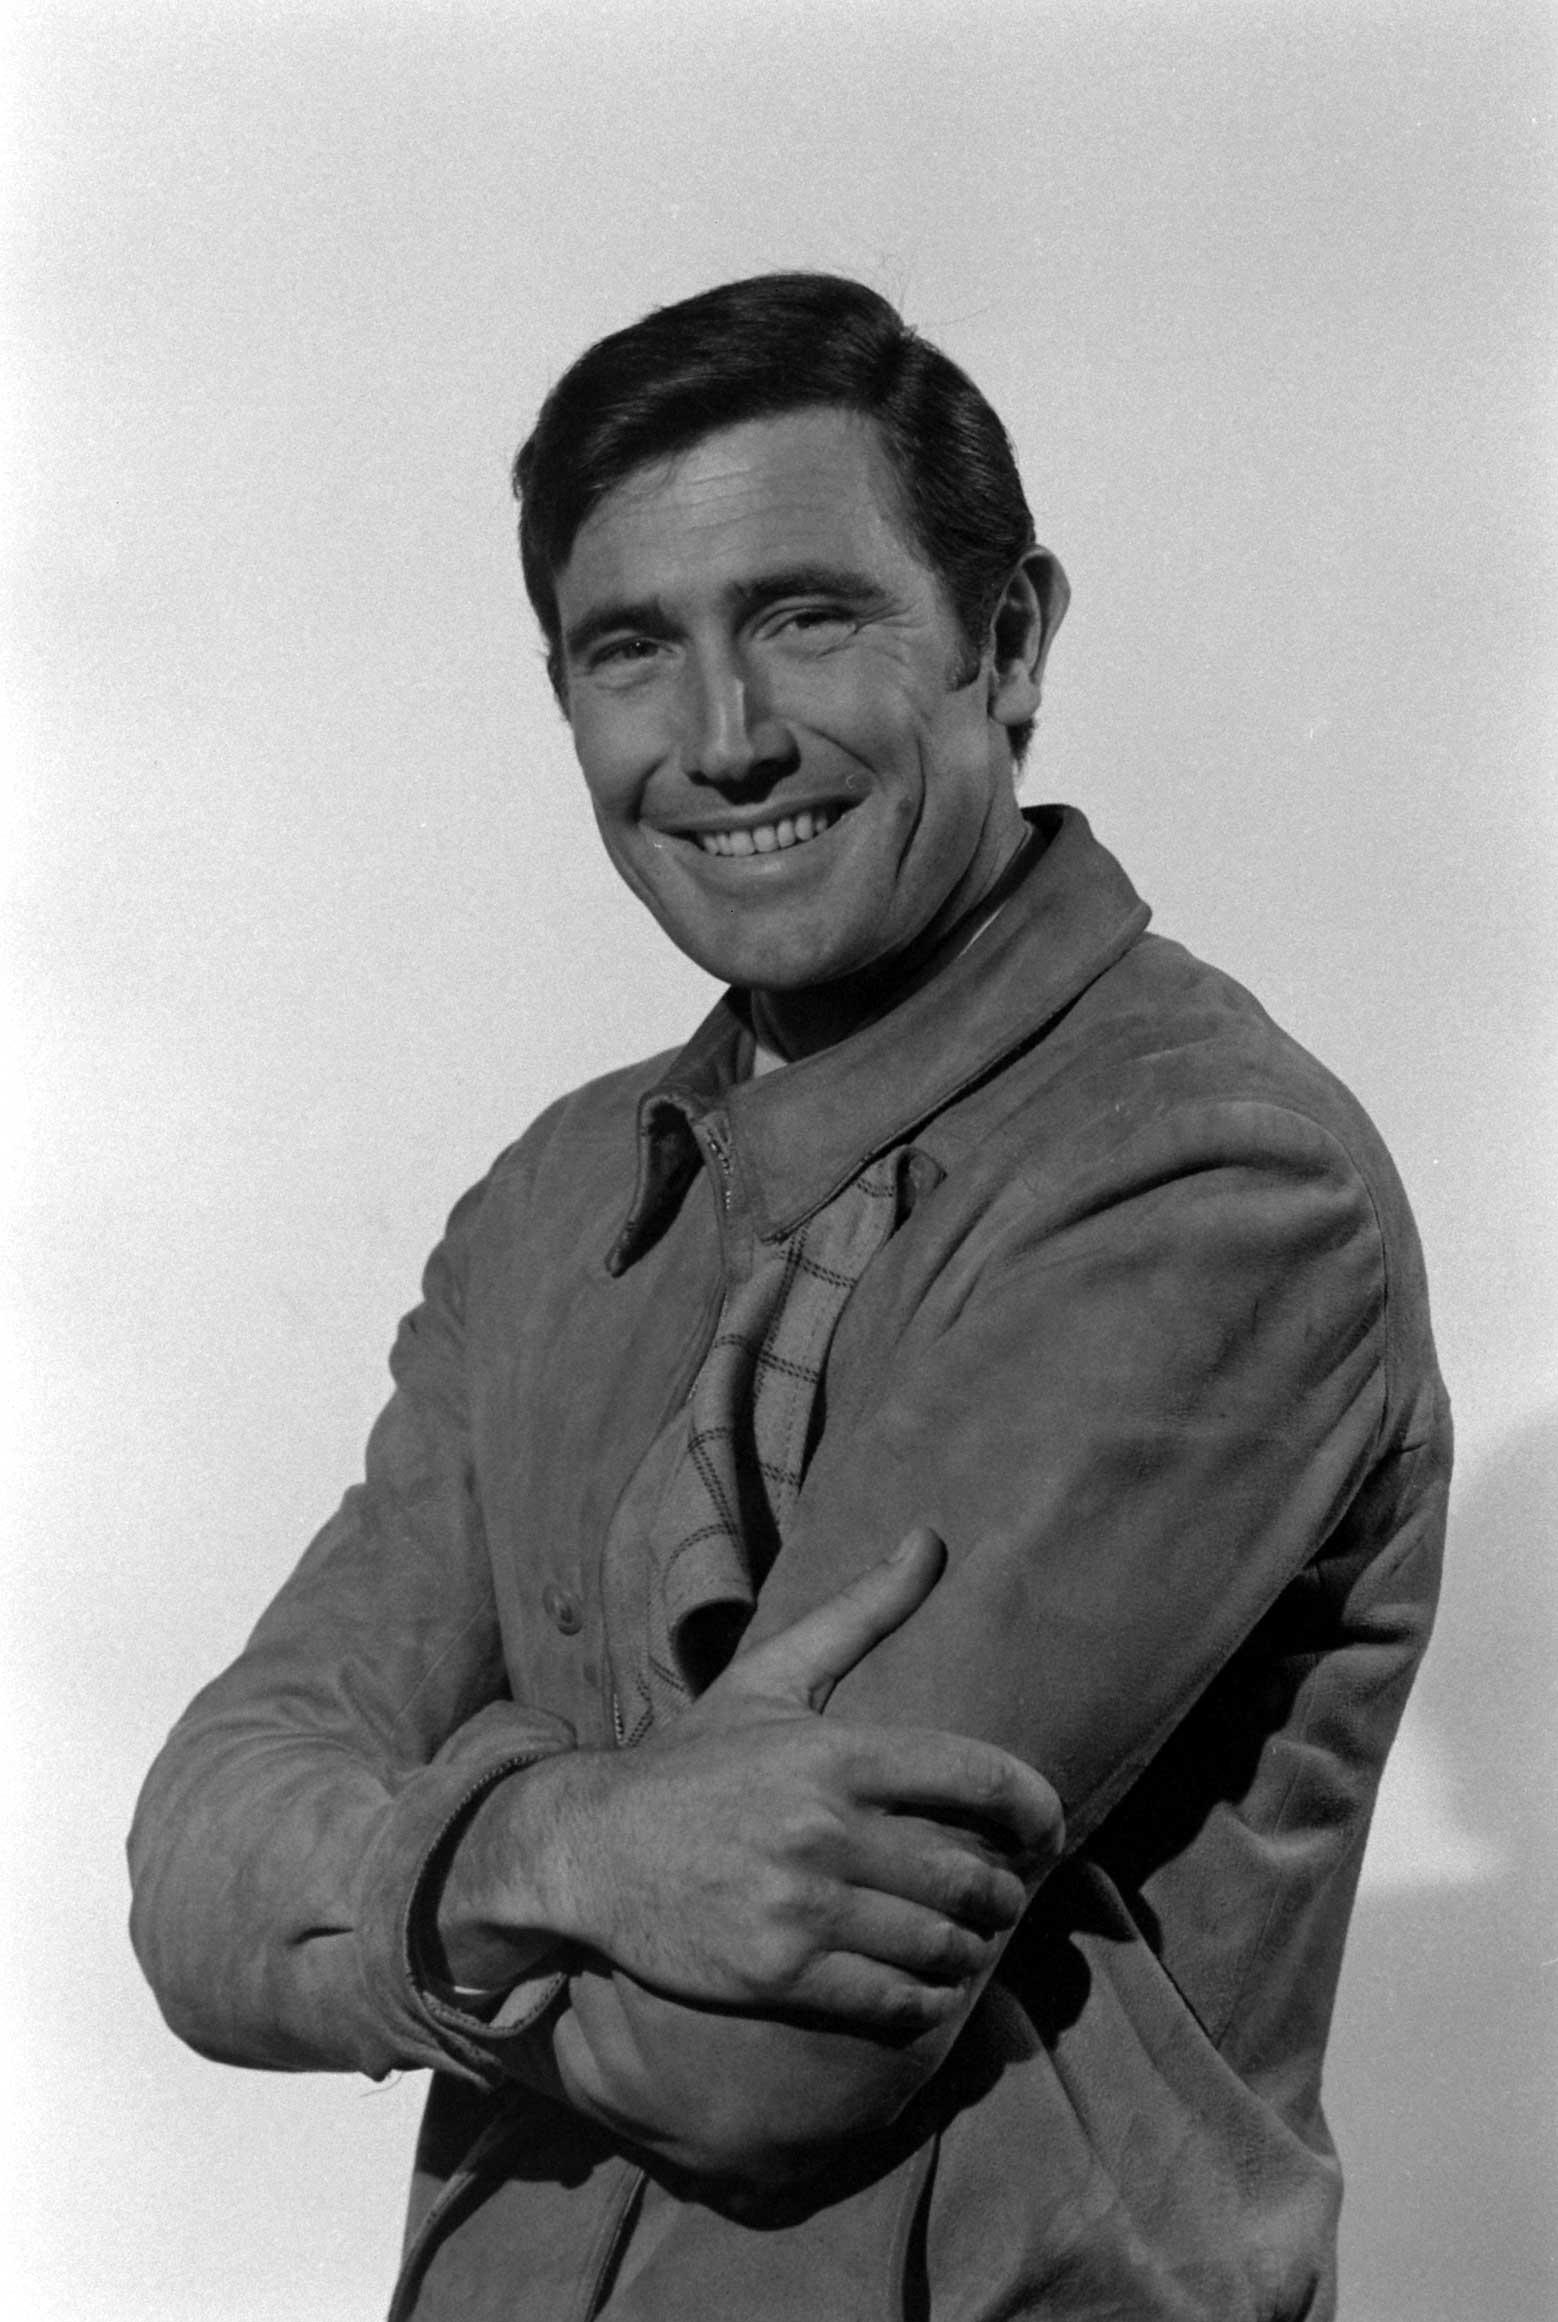 George Lazenby during James Bond audition, 1967.